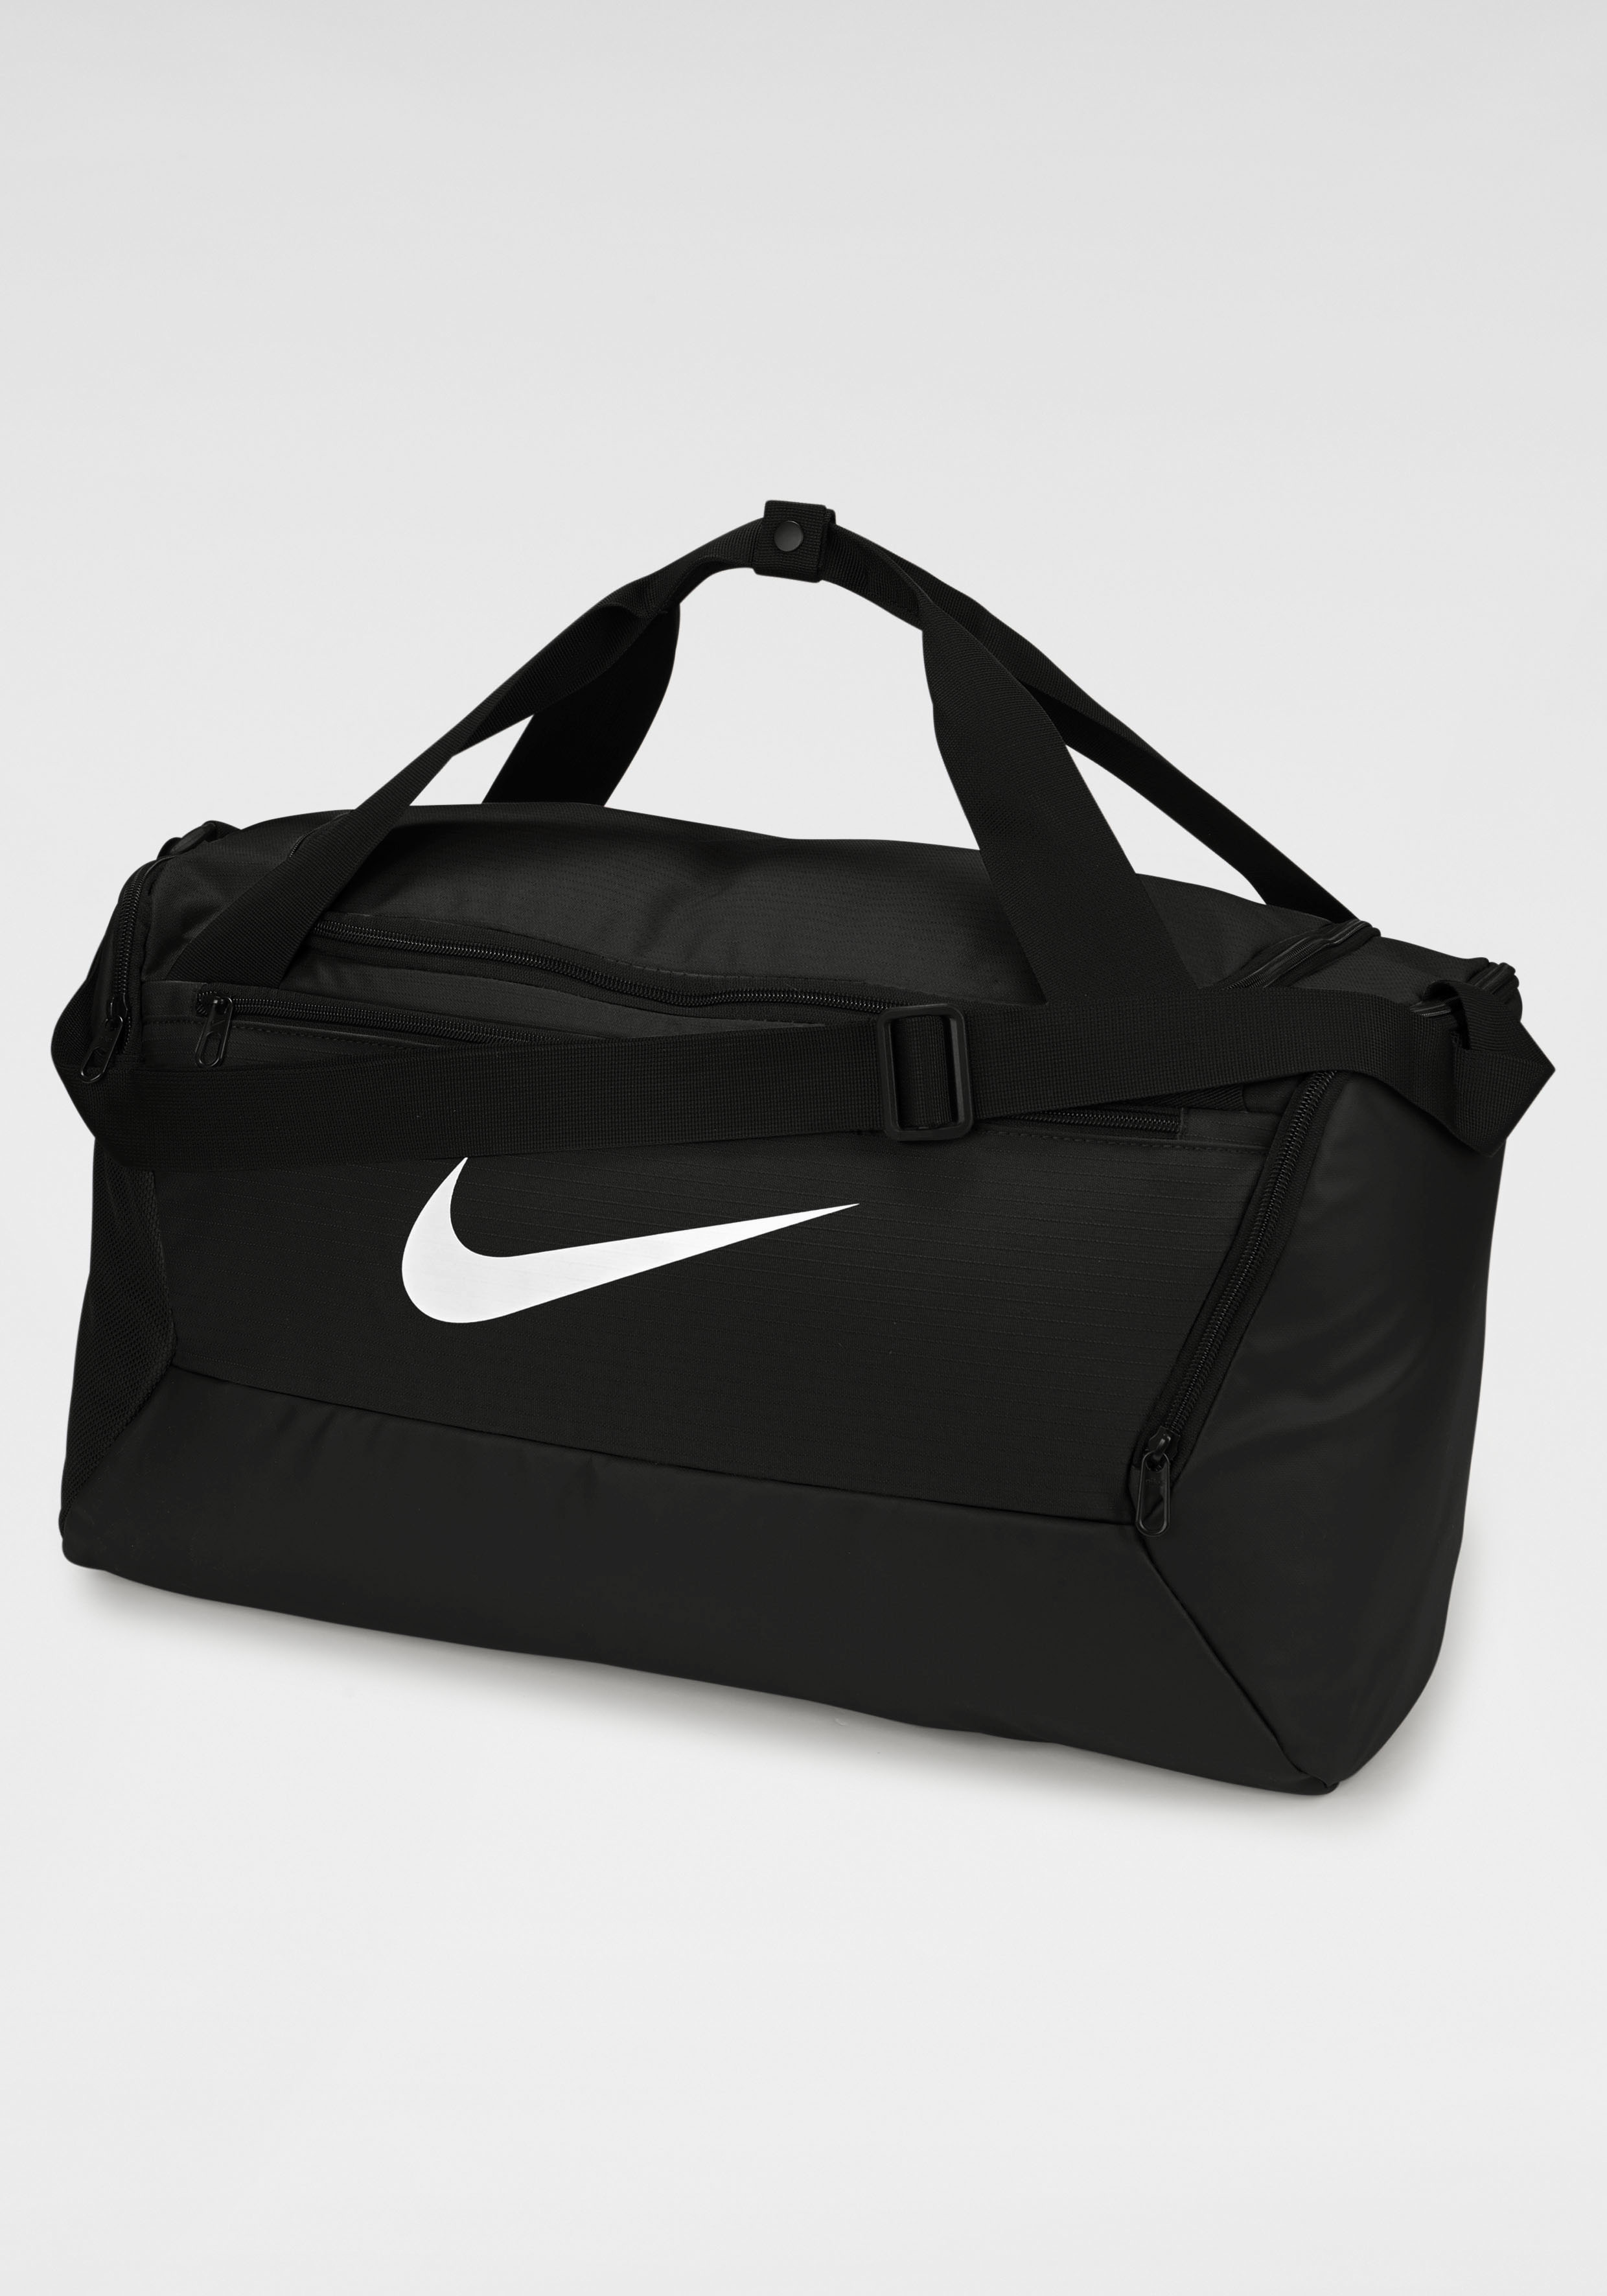 Nike Sporttasche NIKE BRSLA S DUFF -9.0 schwarz Taschen Unisex